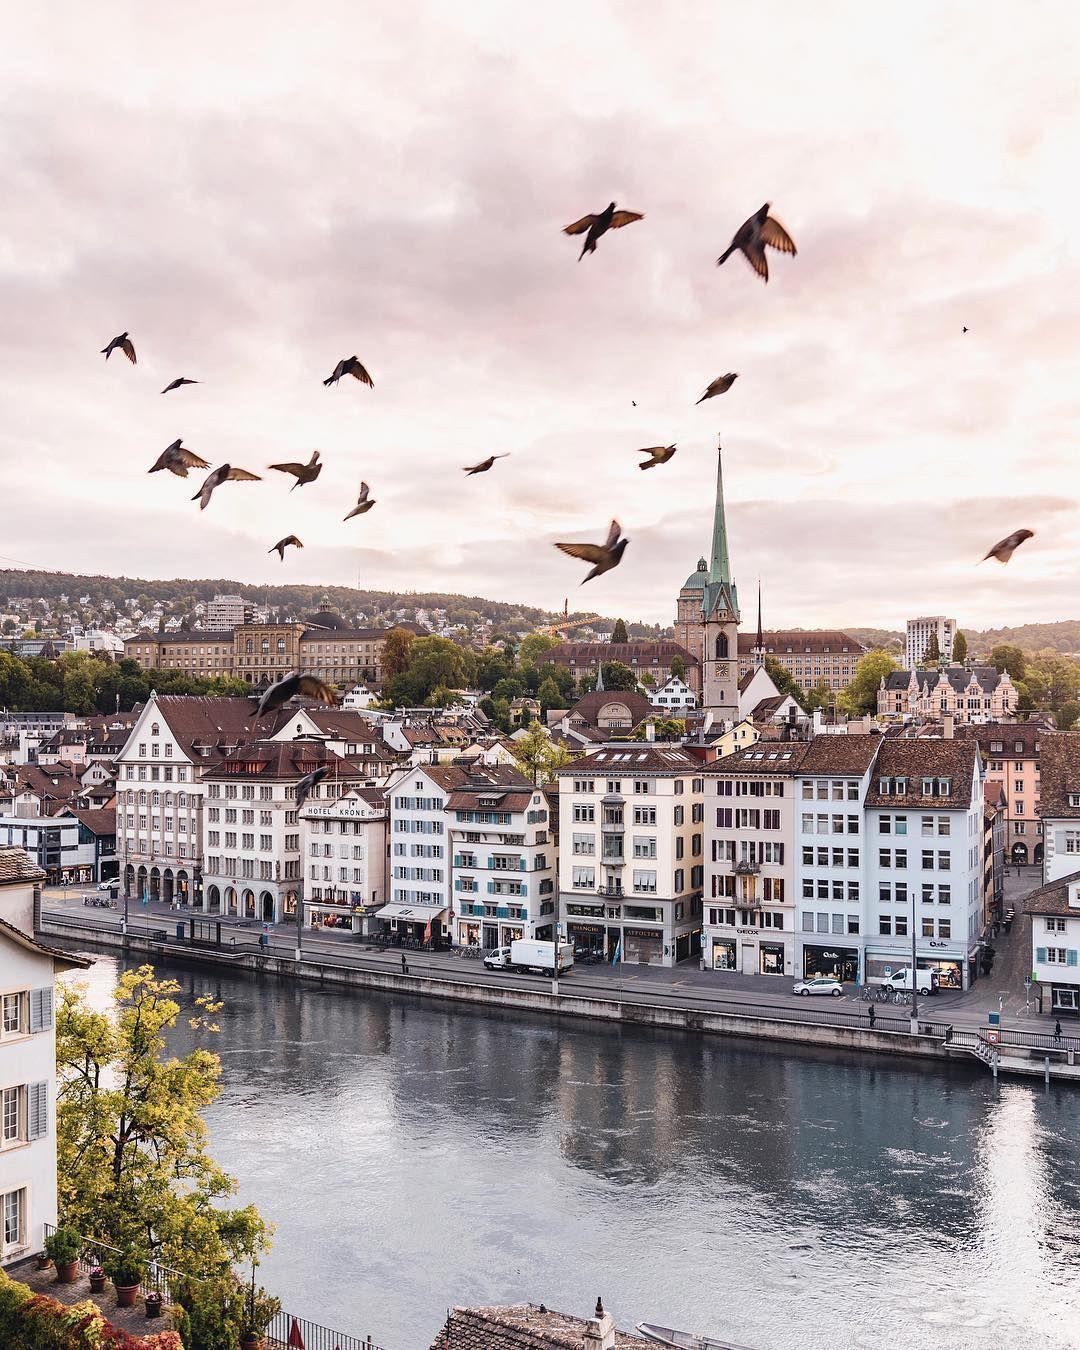 Zurich Travel pictures, Travel insurance, Travel photos